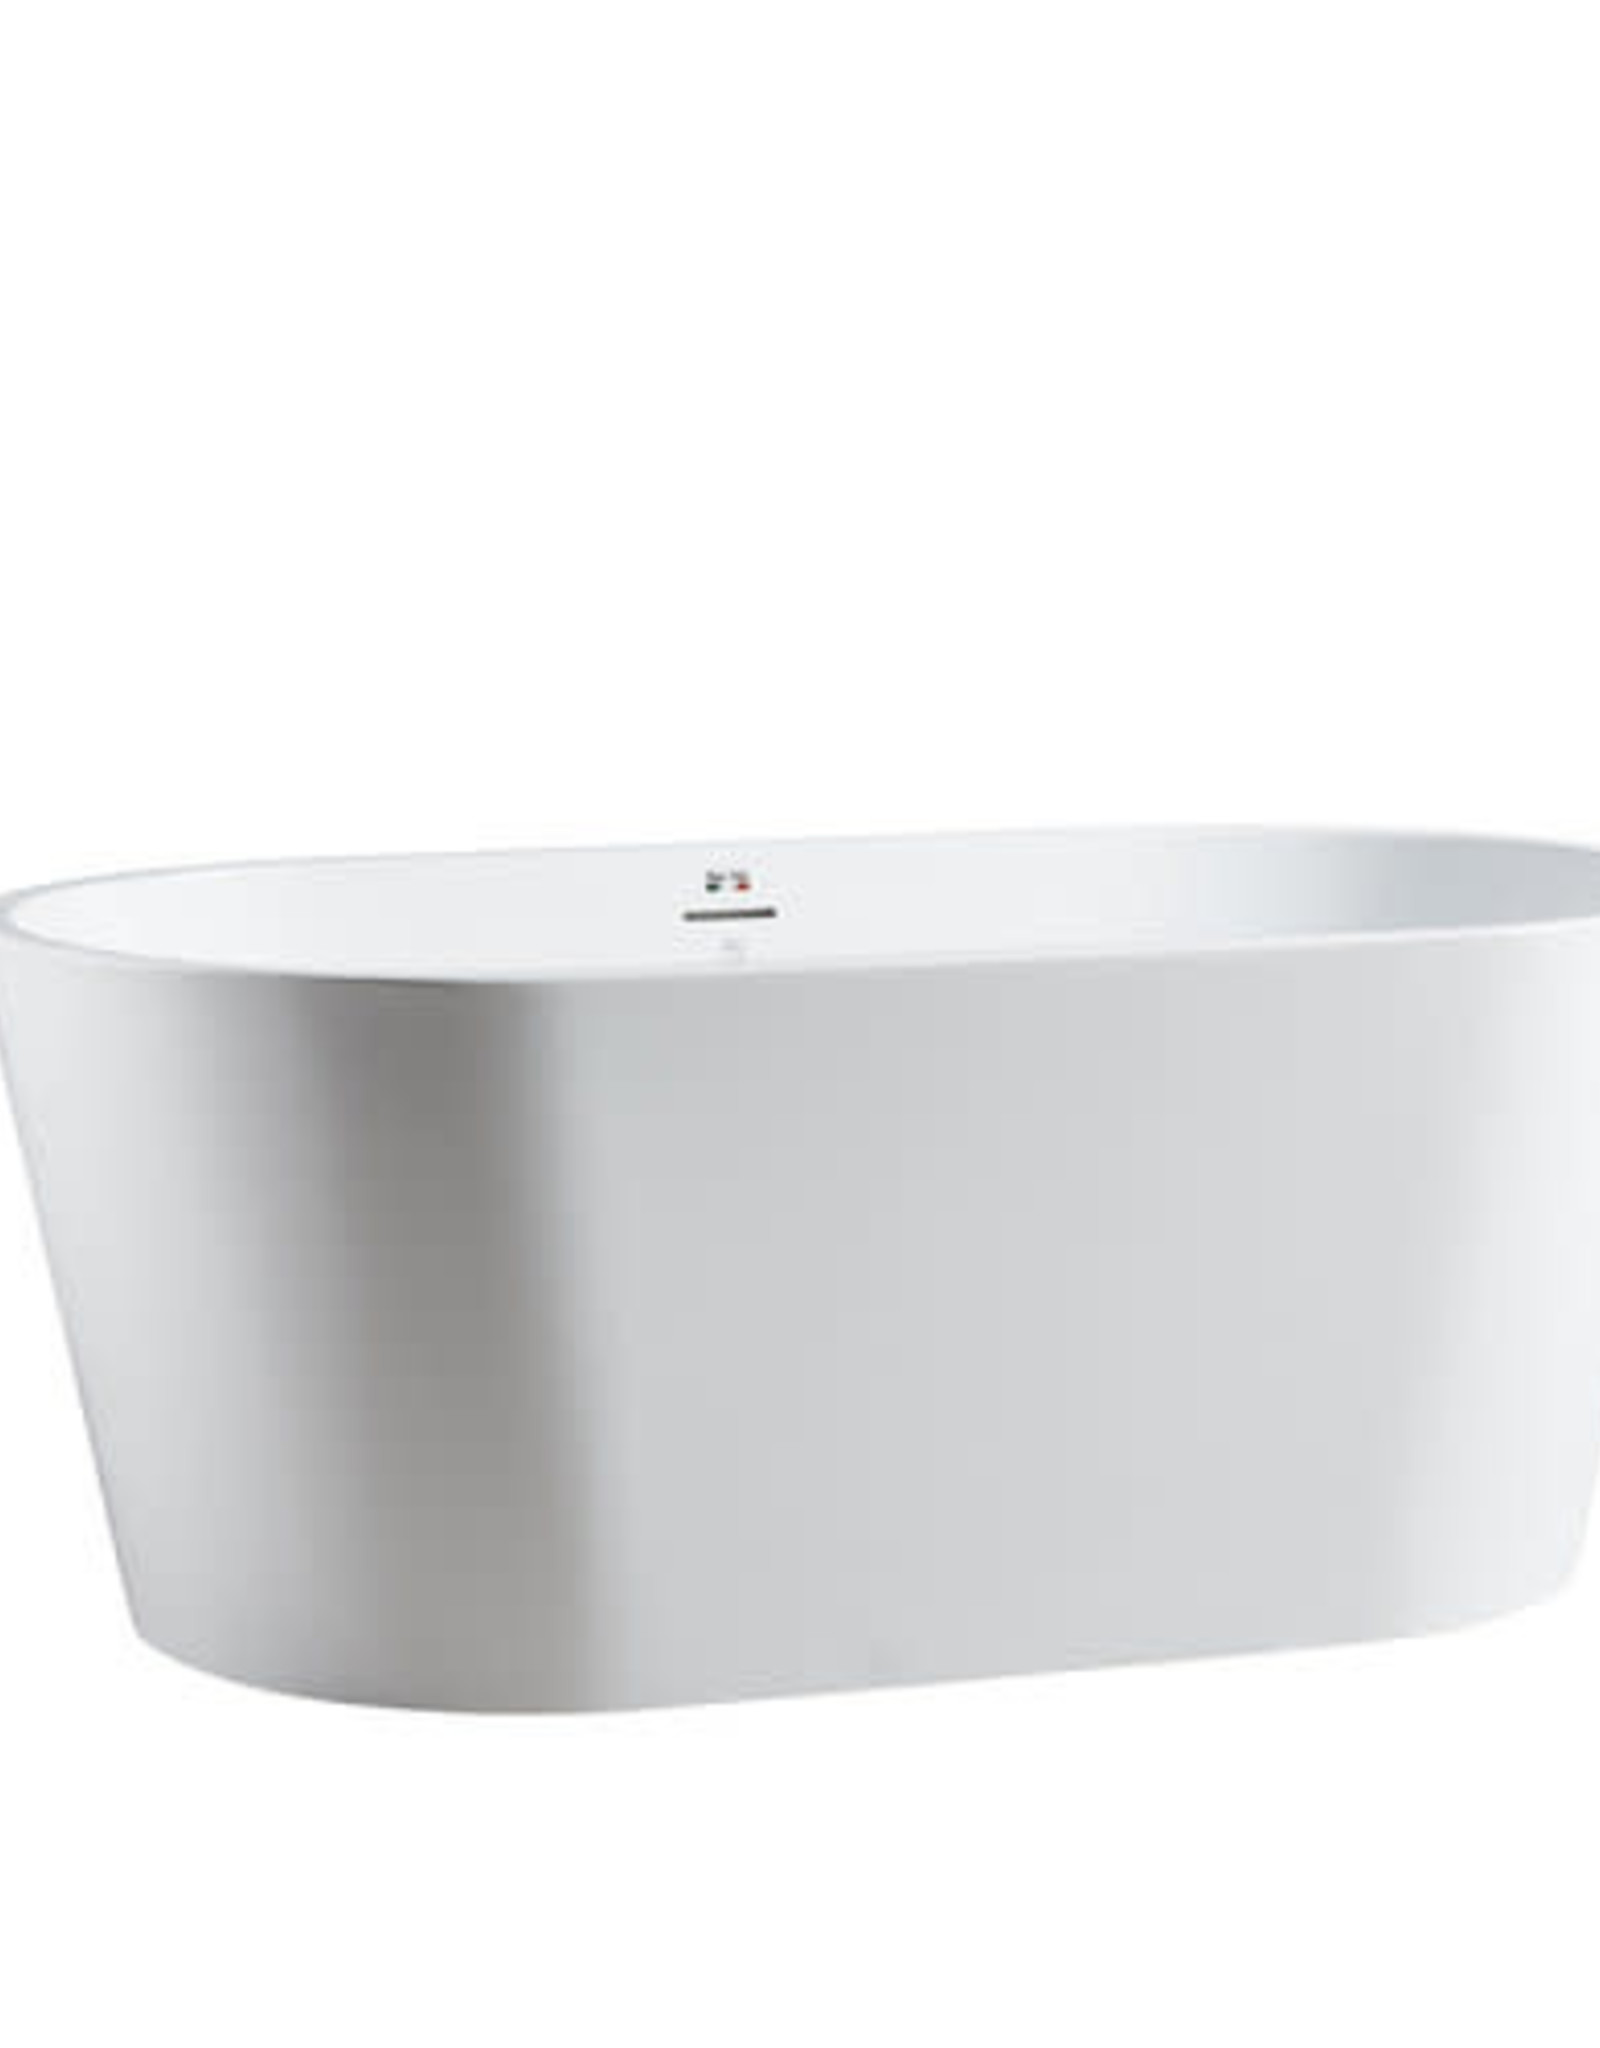 "Bagno Italia Bagno Italia Monaco 59"" Freestanding Tub"